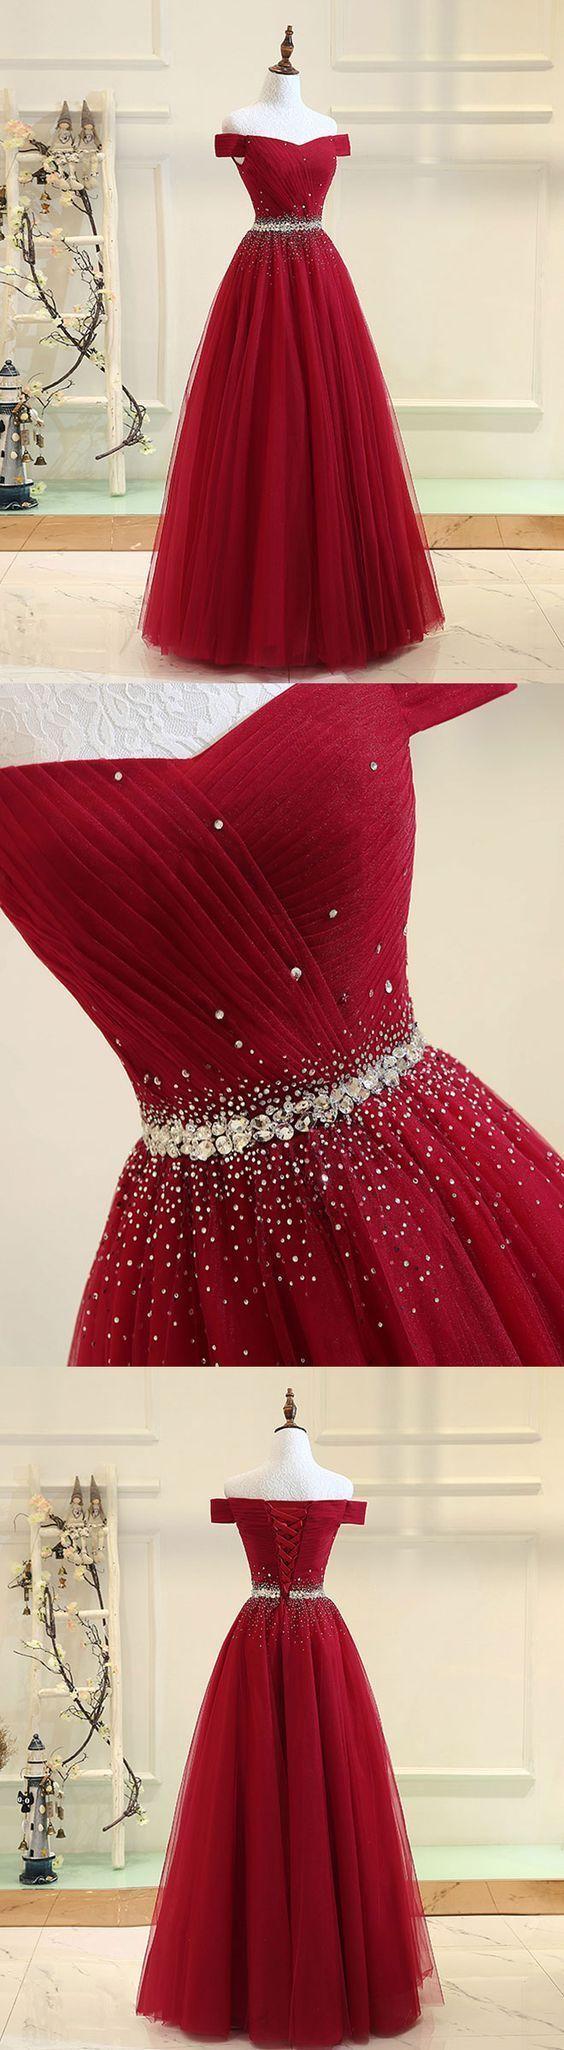 Burgunder Tüll off Schulter langes Abendkleid, Burgunder Abendkleid M1204